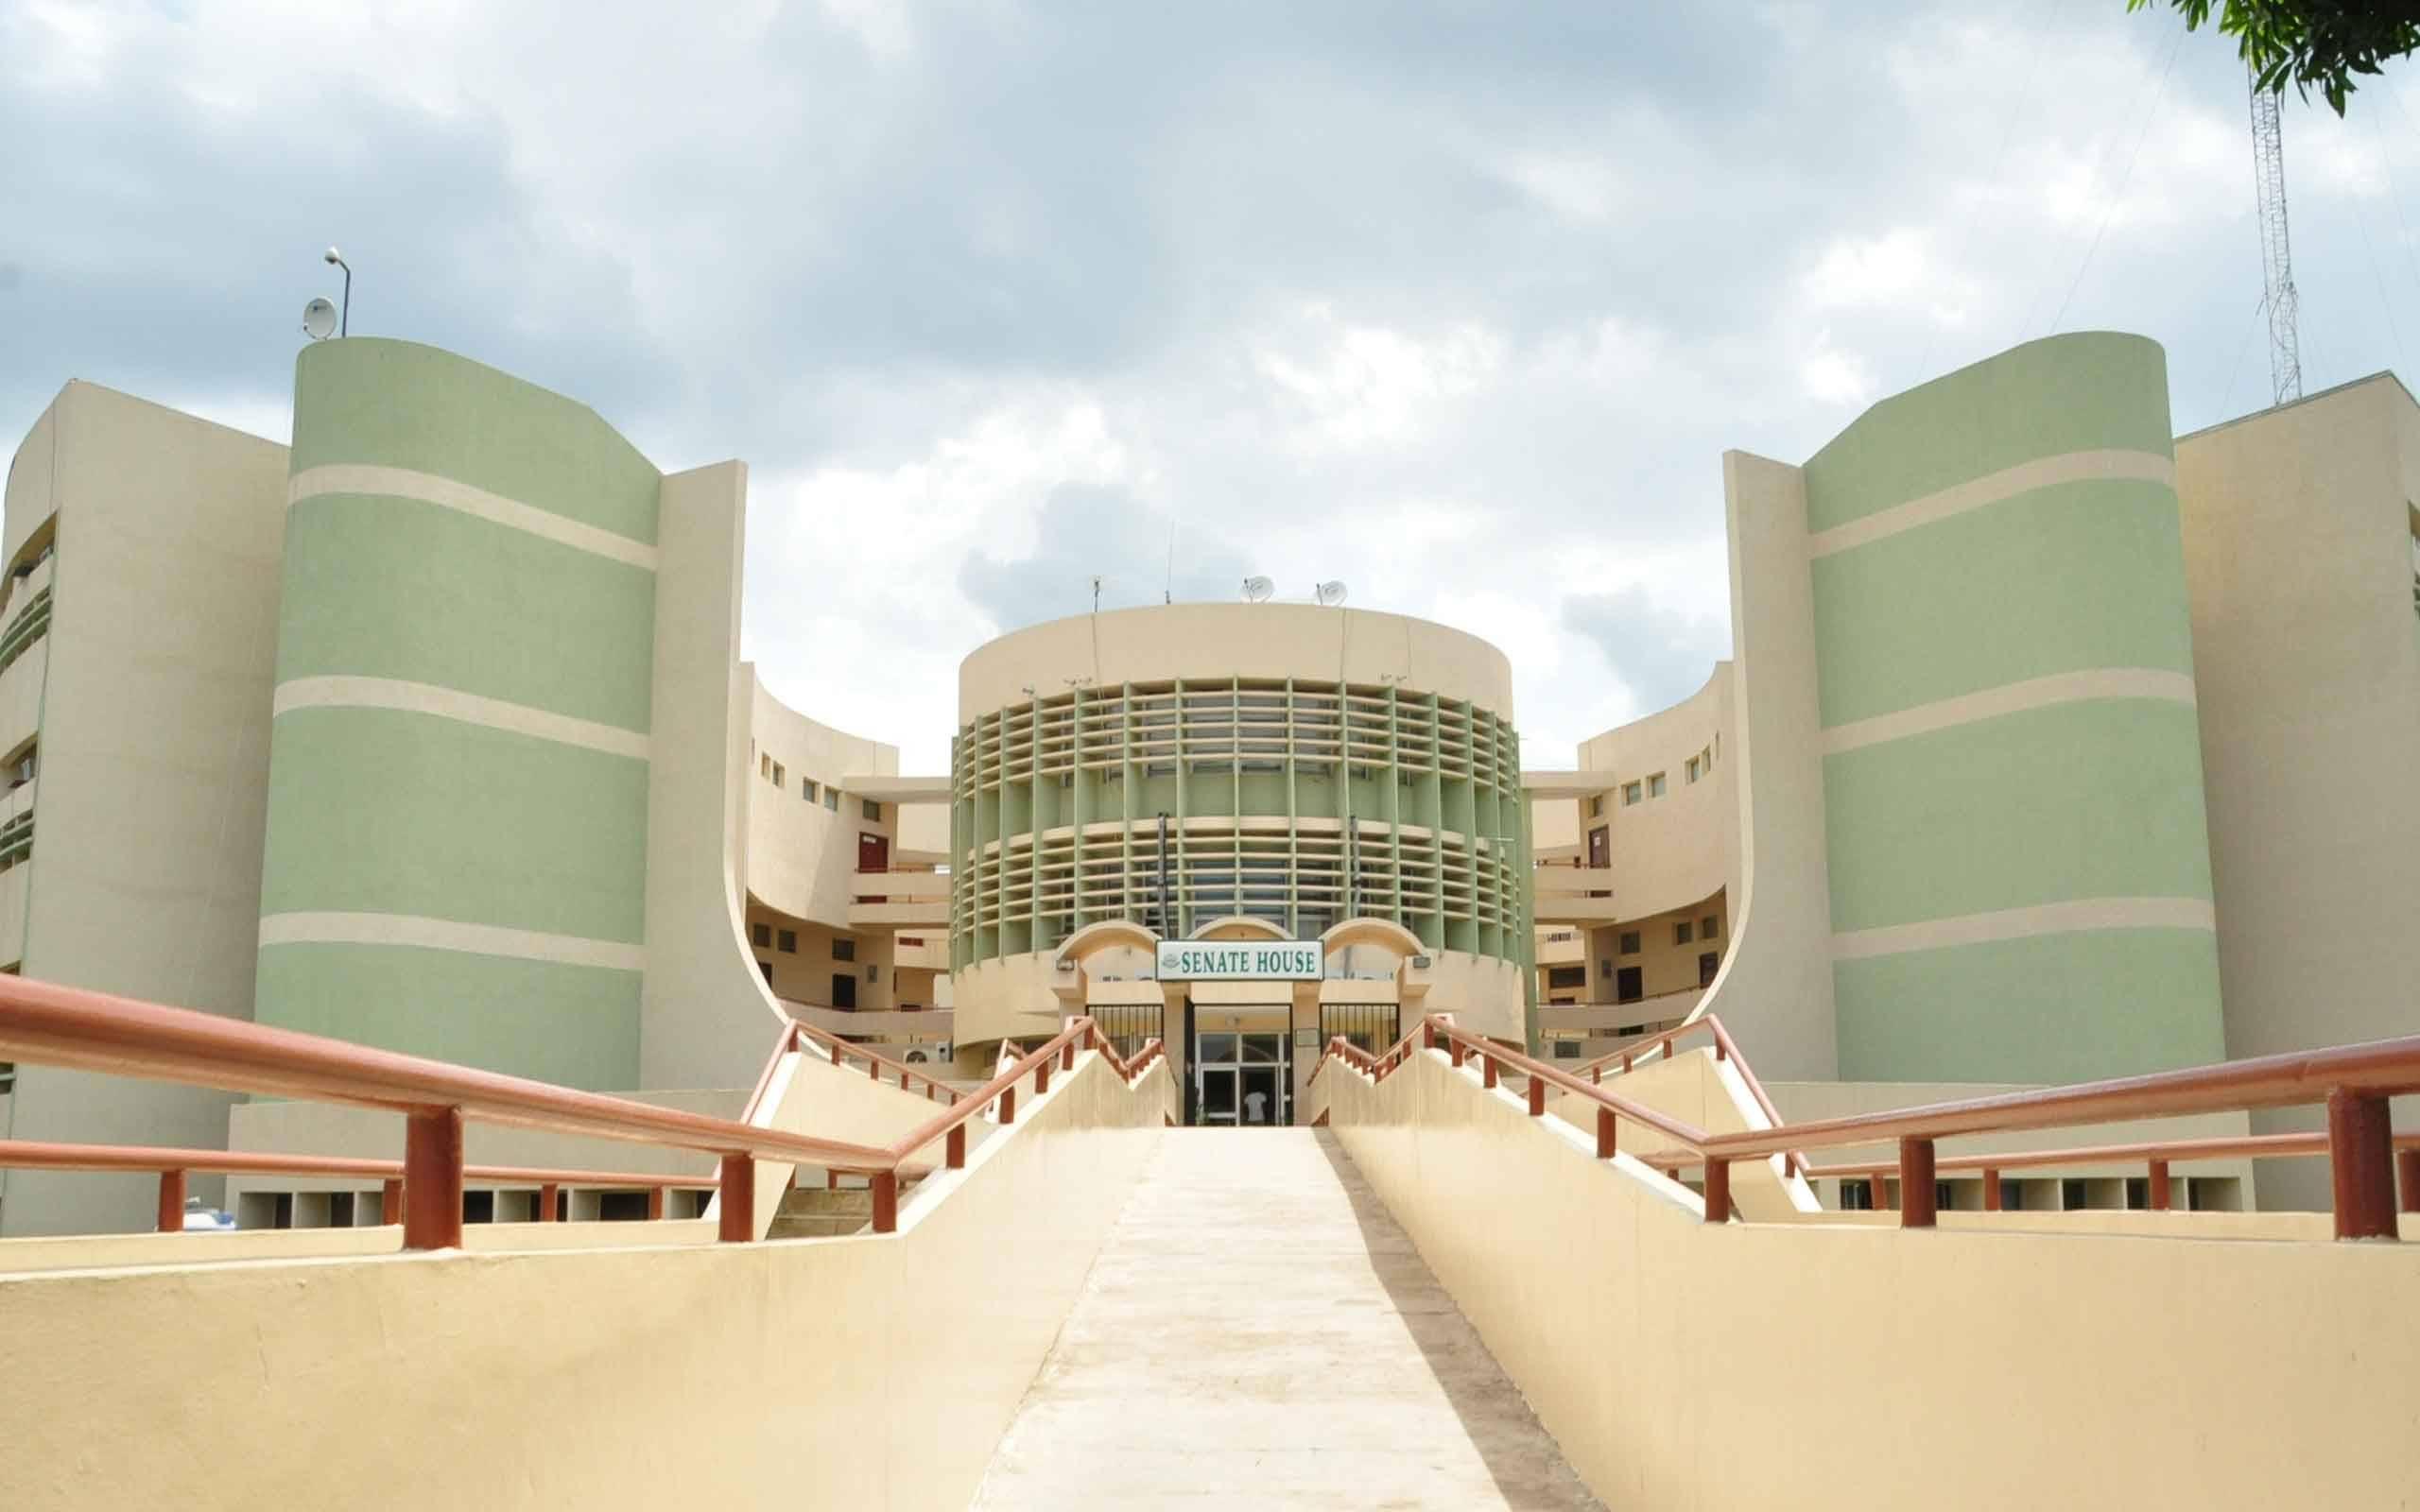 Federal University of Agriculture, Abeokuta